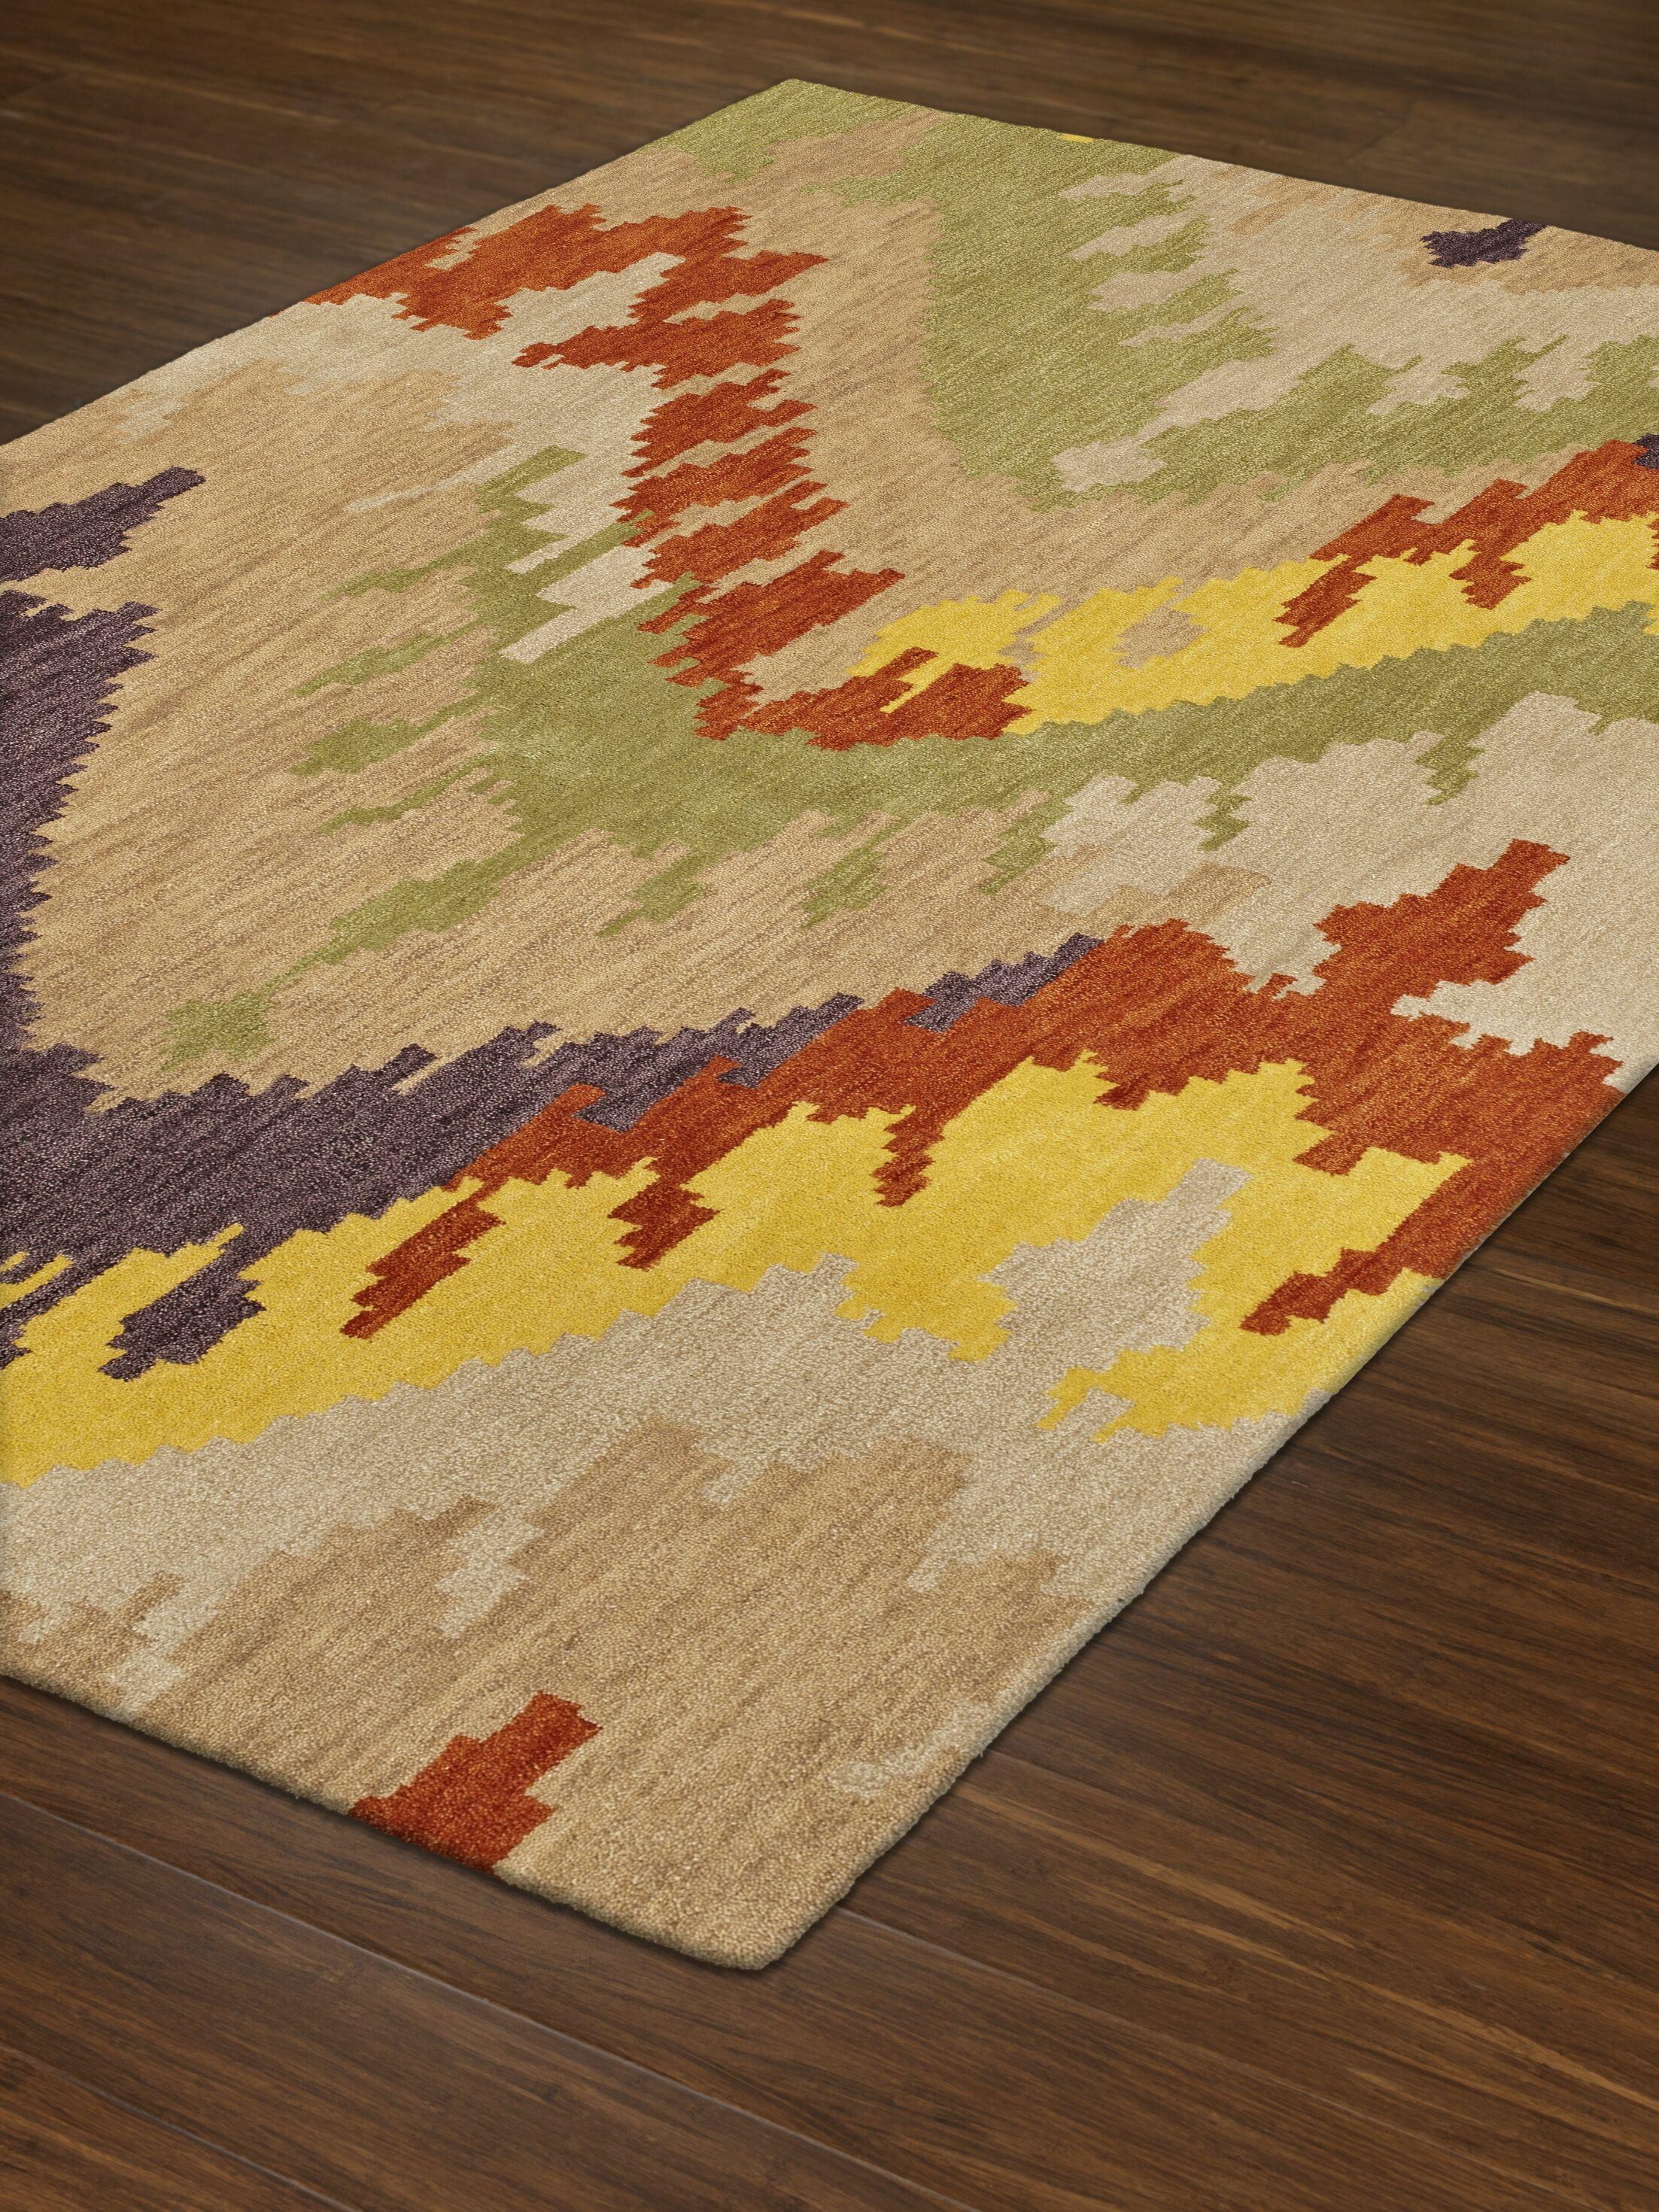 Impulse Wool/Silk Ivory/Yellow Area Rug Rug Size: Rectangle 9' x 13'